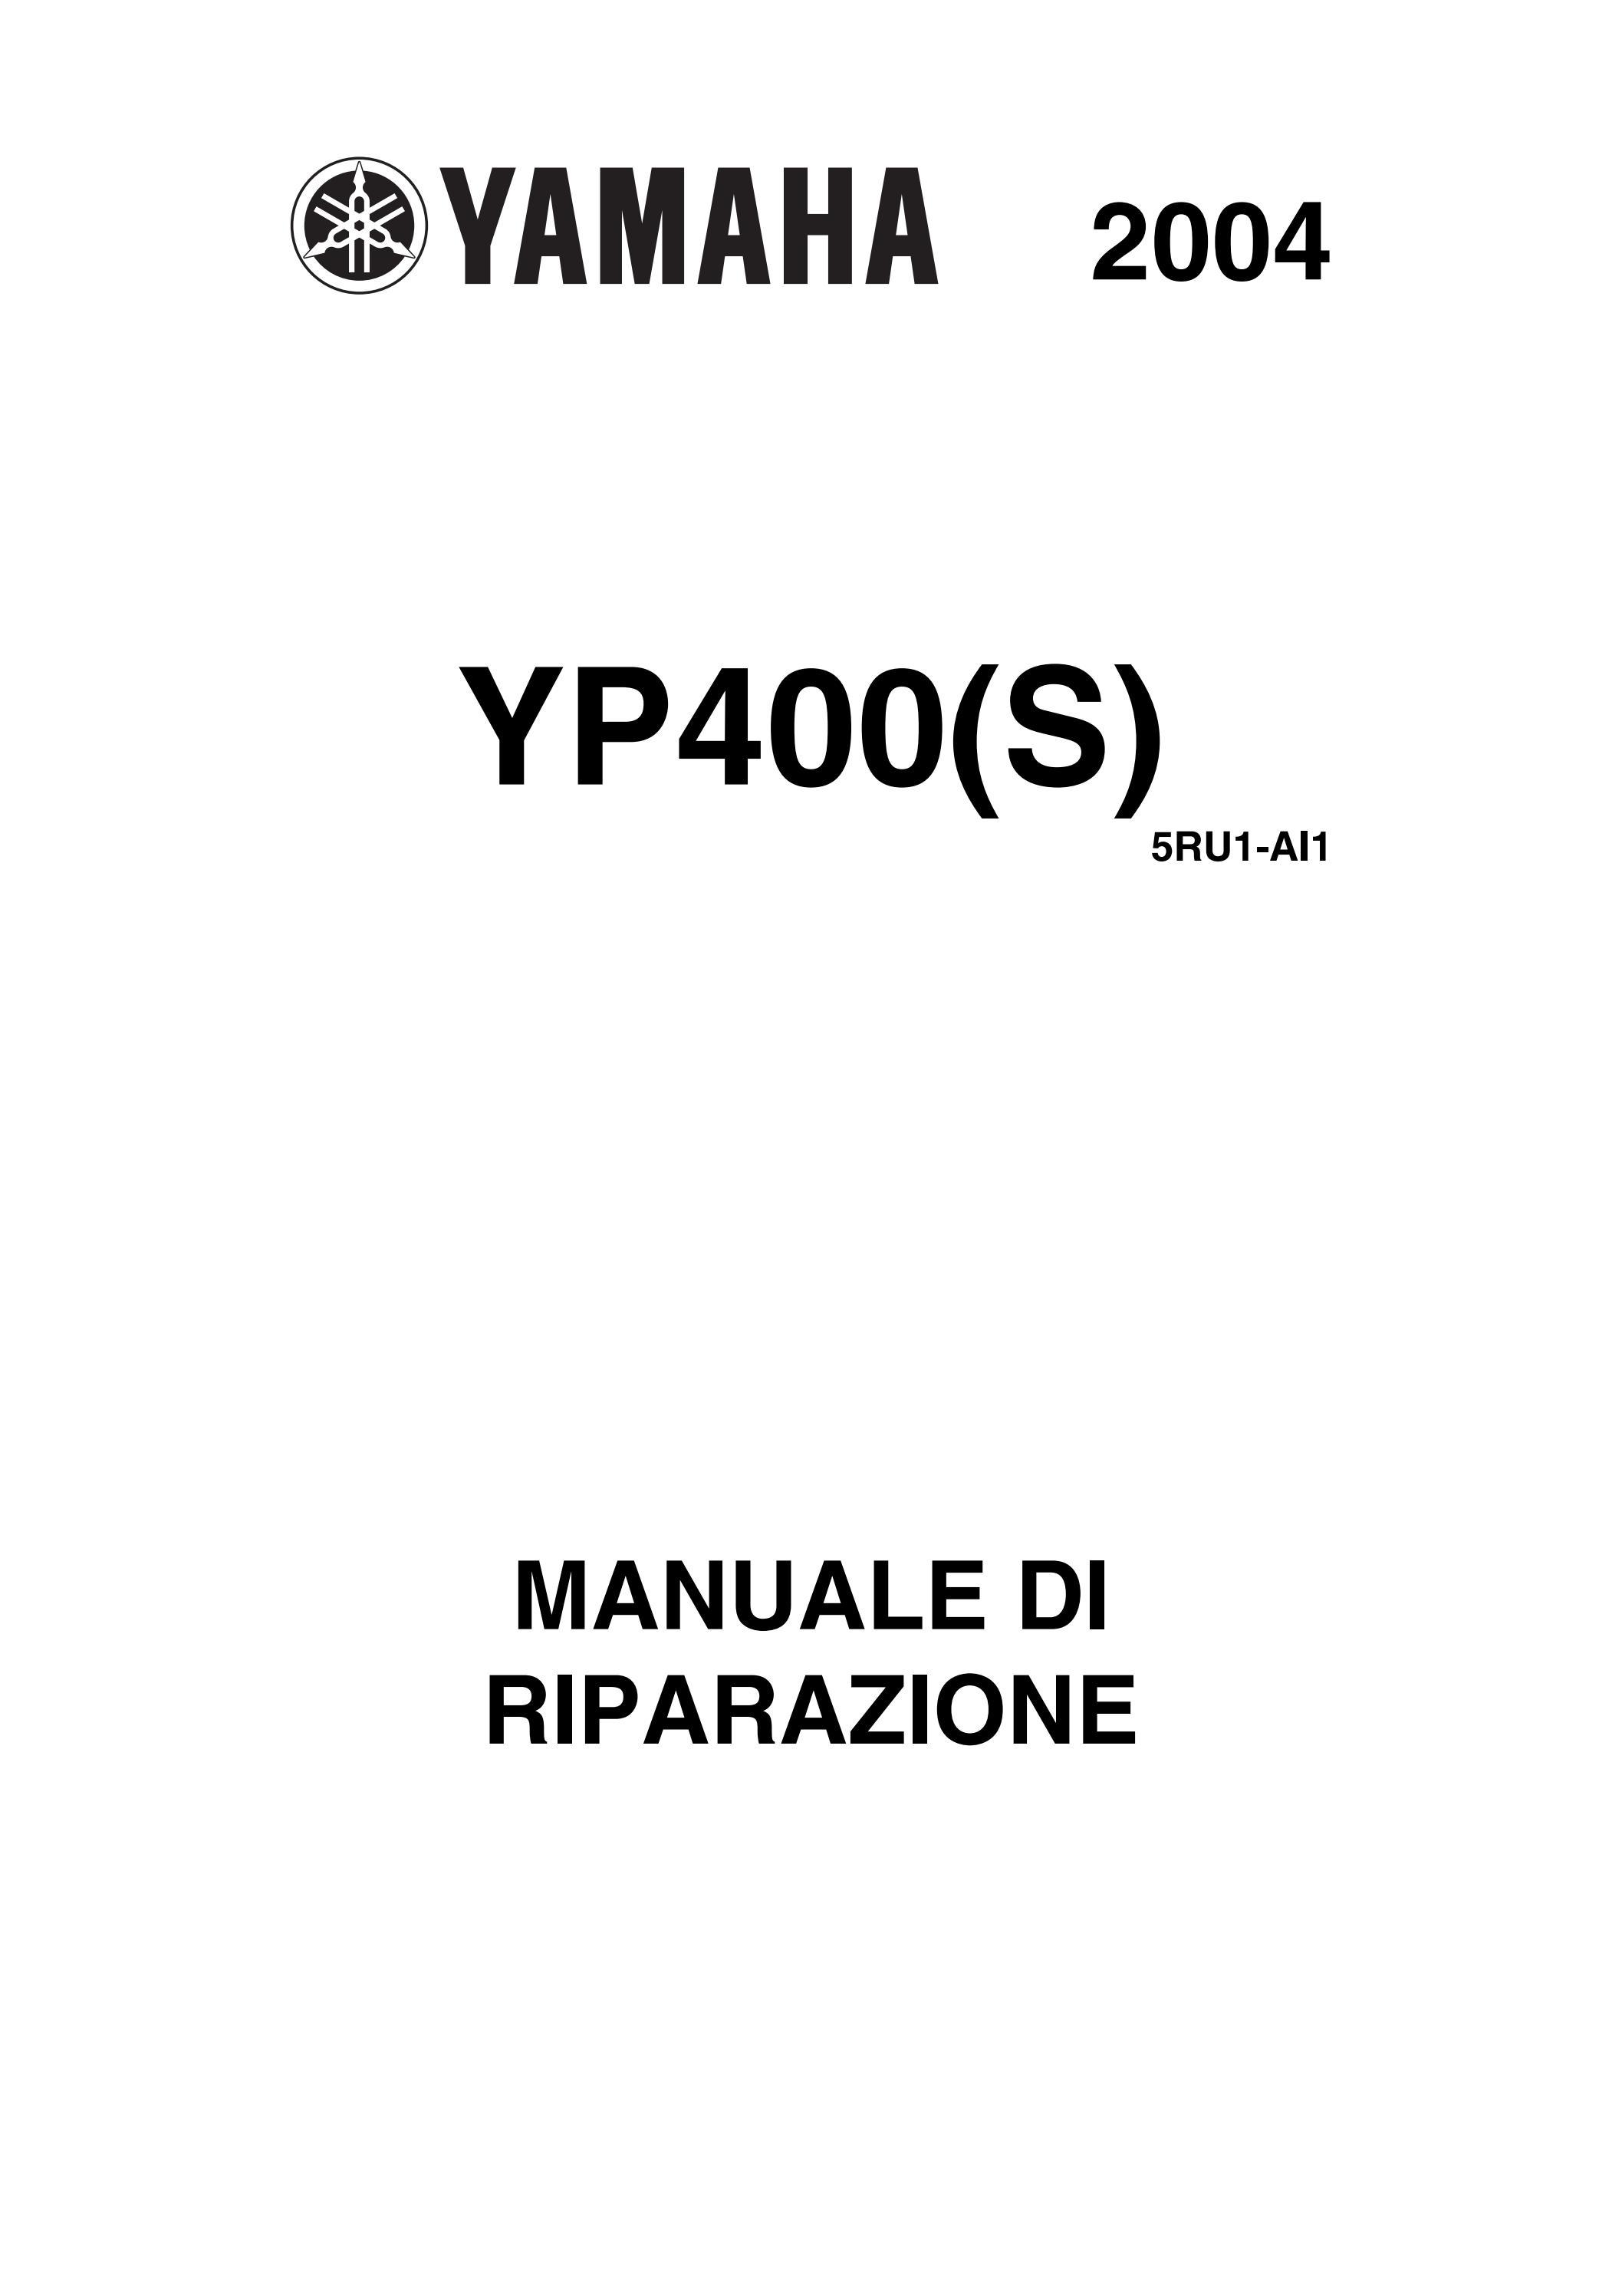 Schema Elettrico Max 250 : Manuale officina yamaha majesty 400 ita by diego b issuu